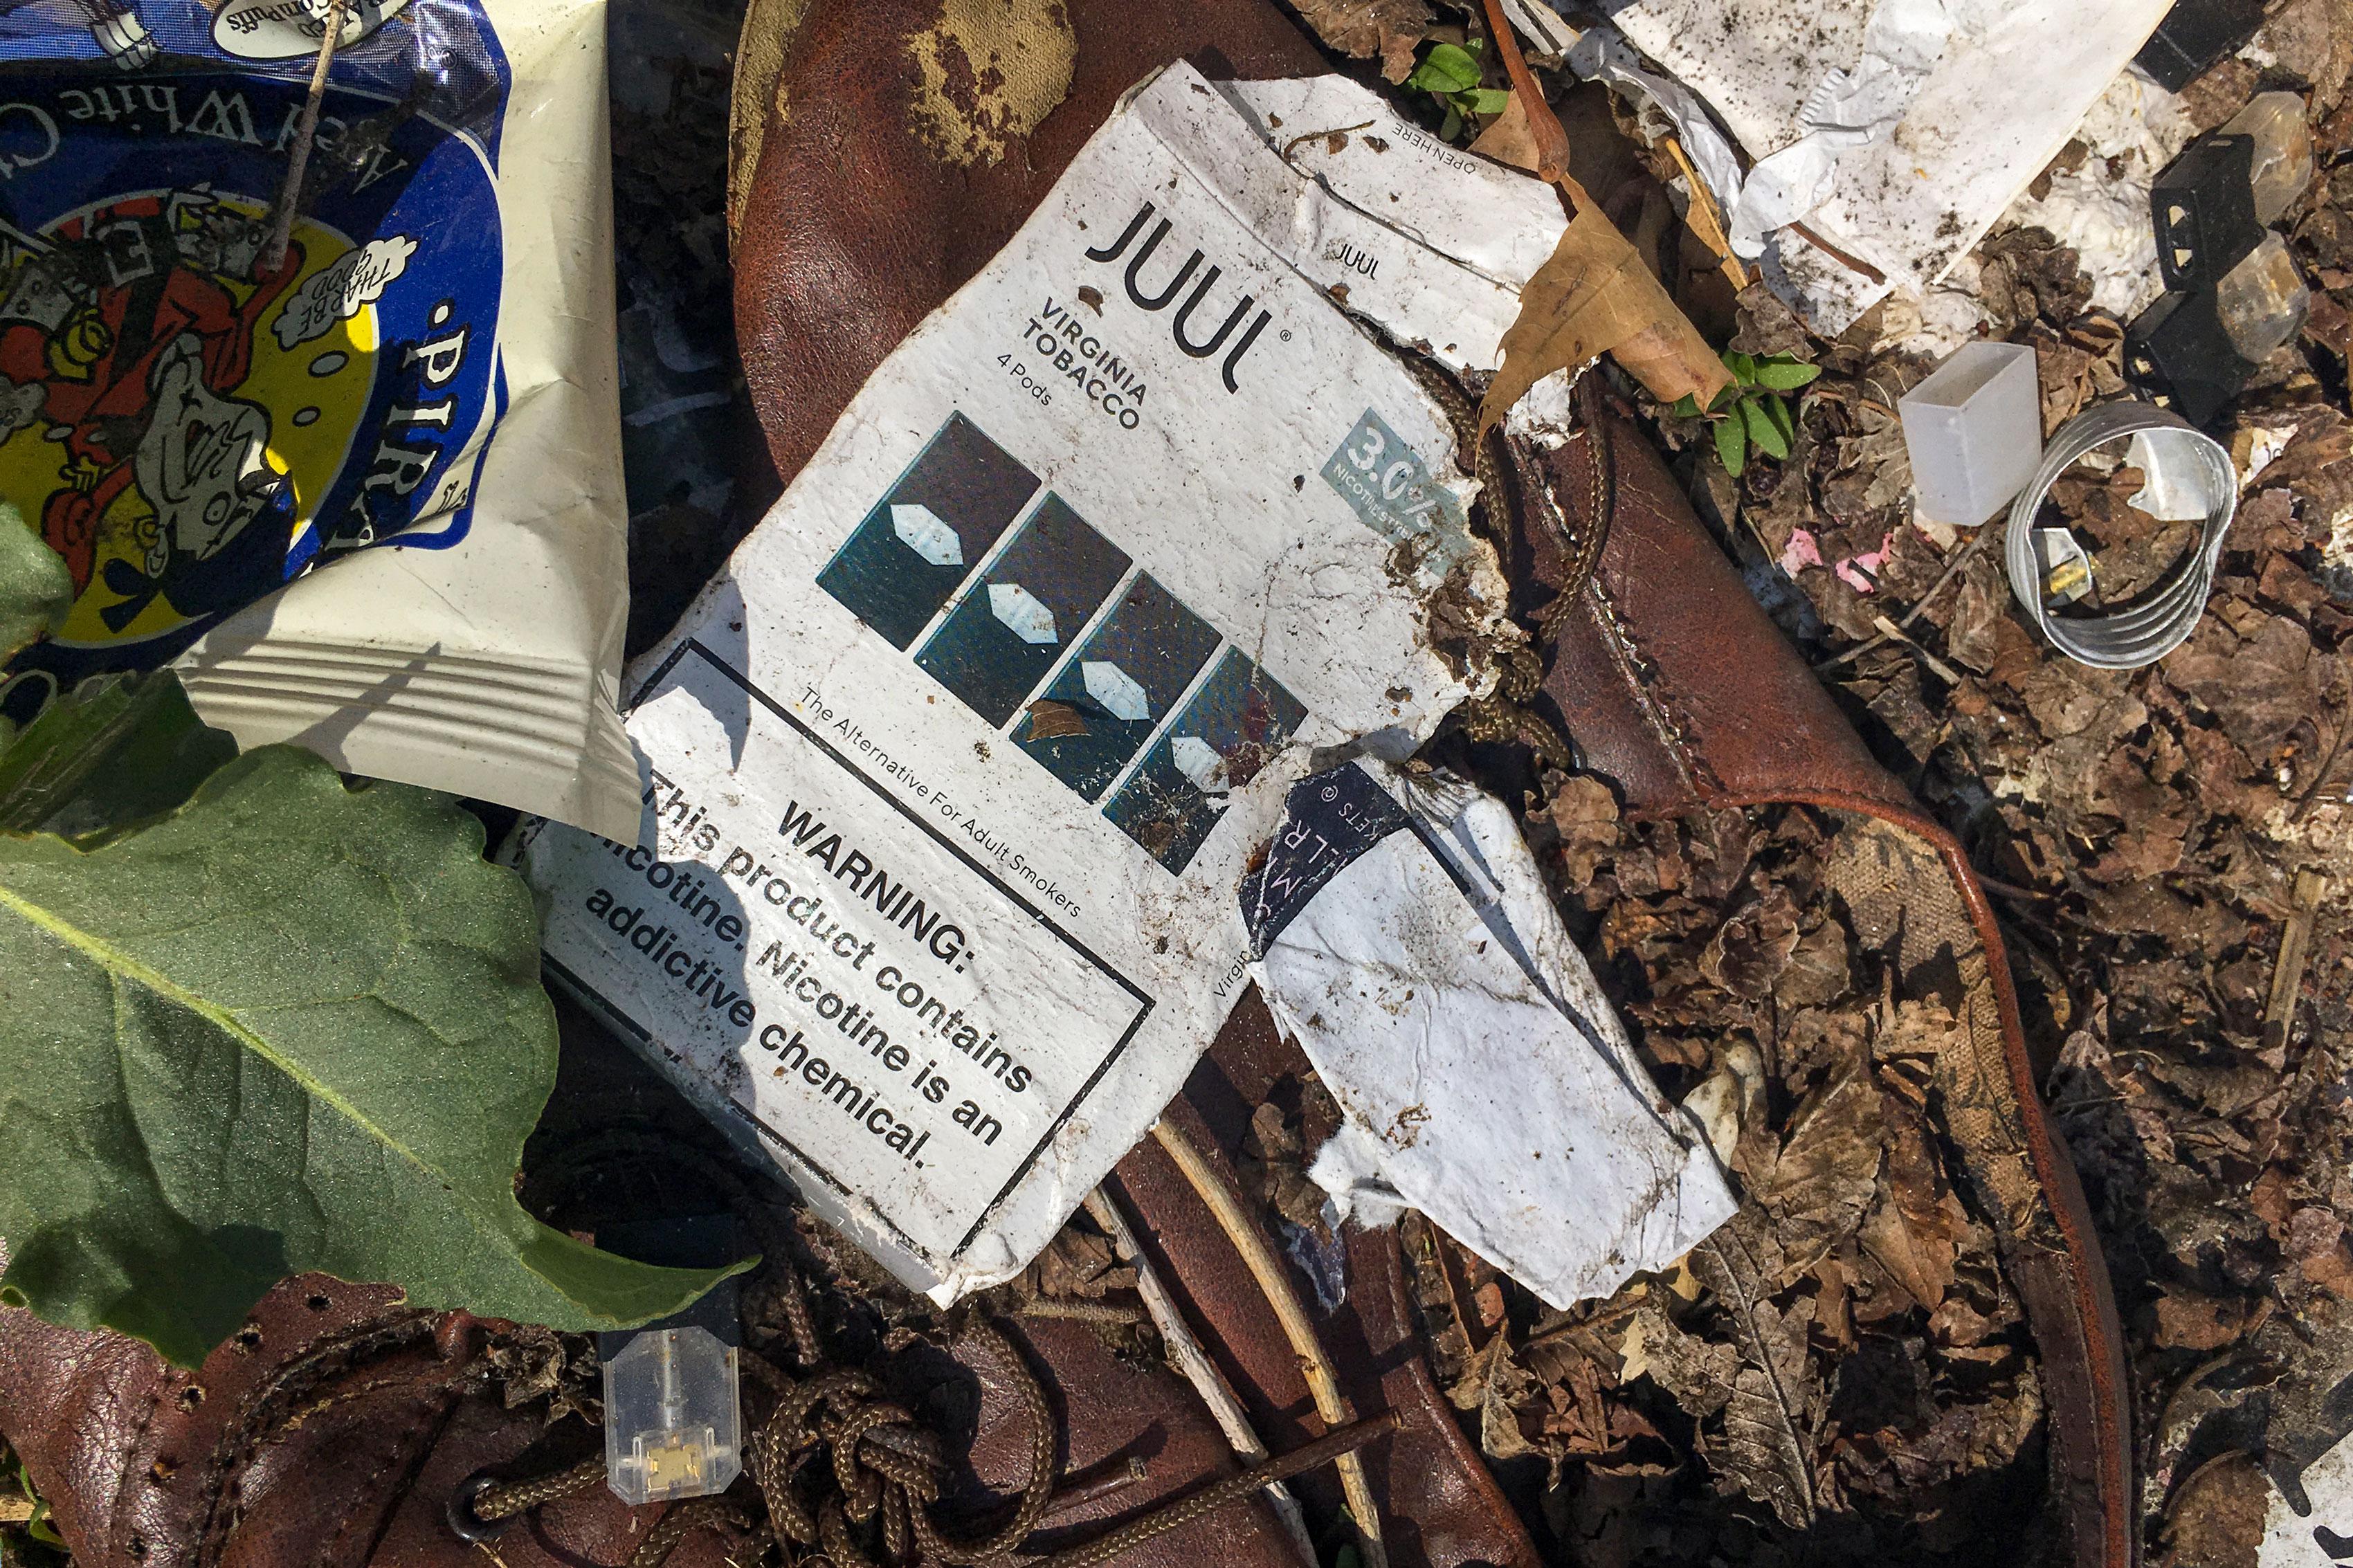 Photo: E-Cig E-Waste 5 | Boulder High Trash - JDaley